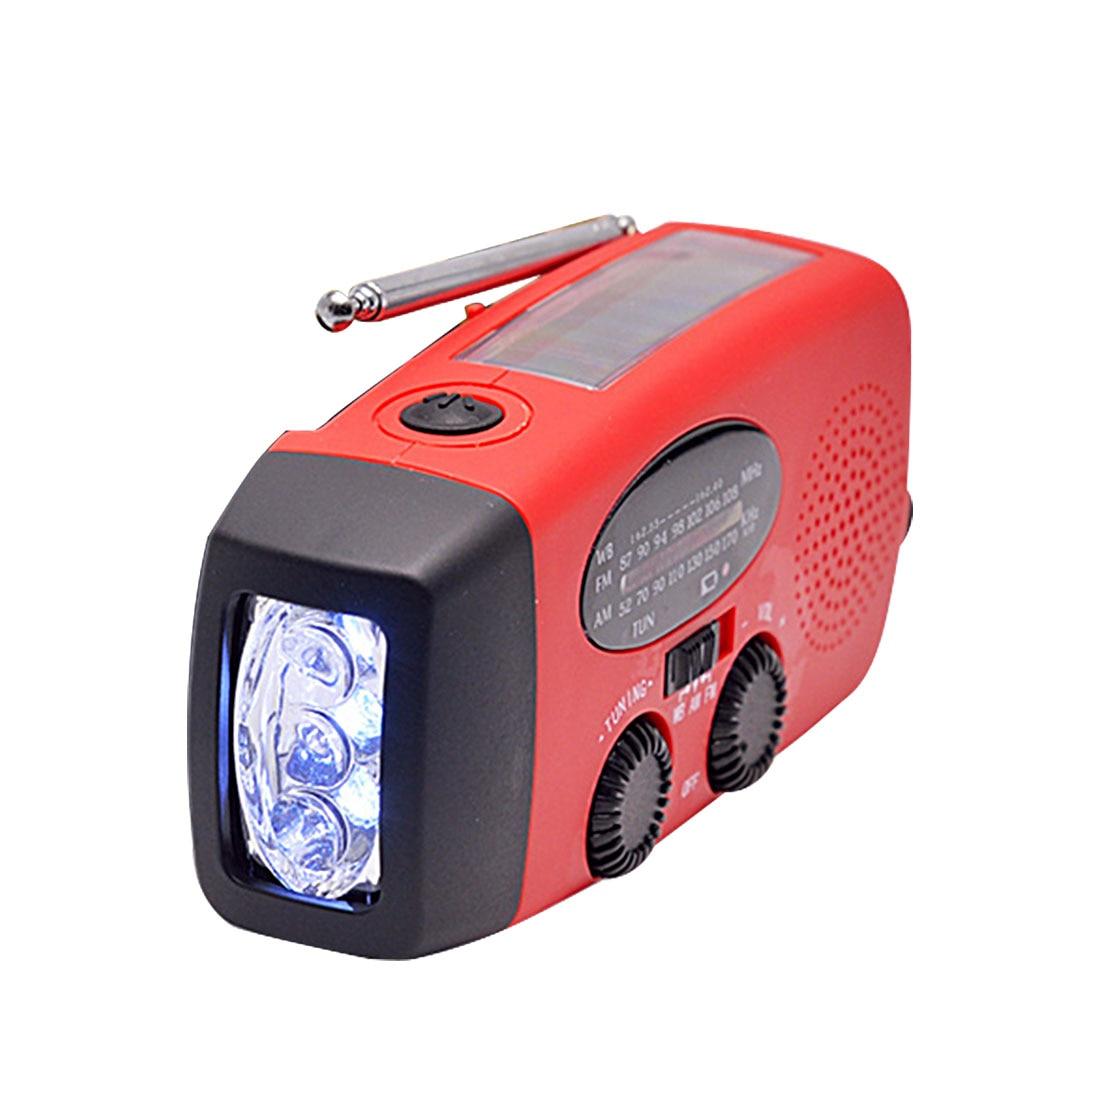 Genial Protable Solar Radio Handkurbel Self Powered Handy-ladegerät 3 Led-taschenlampe Am/fm/wb Radio Wasserdicht Notfall überleben Rot Tragbares Audio & Video Unterhaltungselektronik